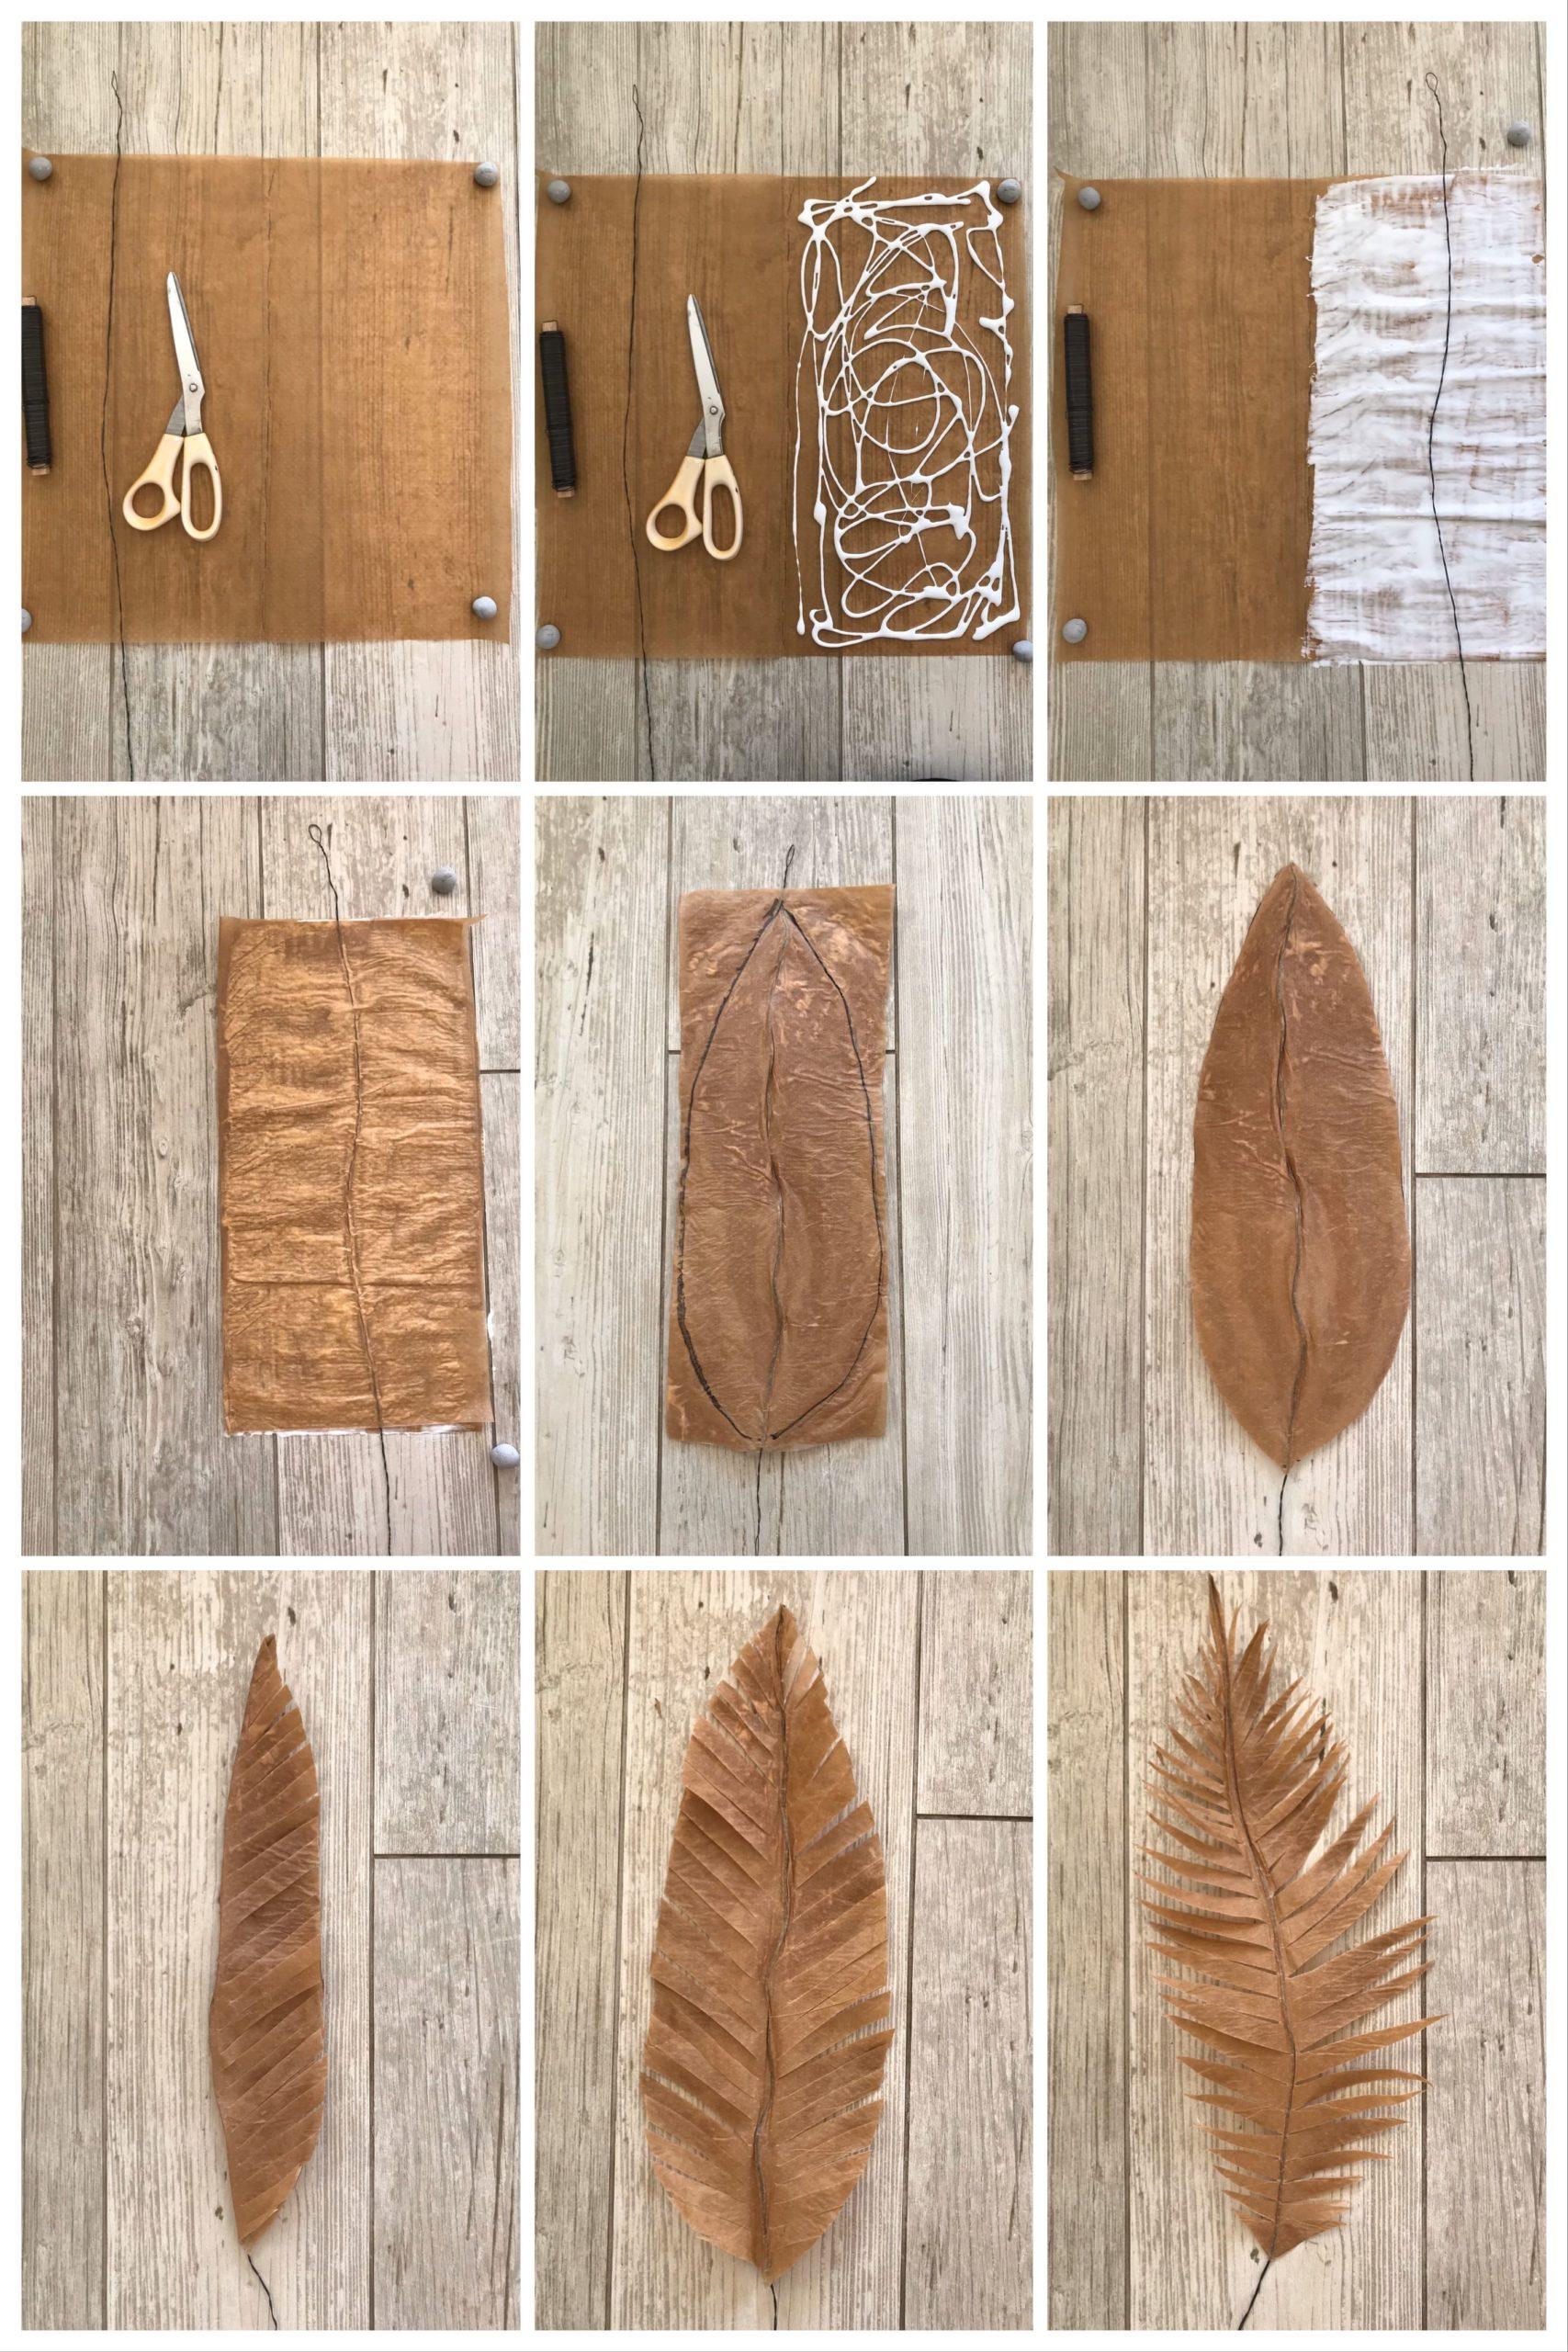 DIY Pflanze aus Papier basteln Palmenblatt aus Backpapier für den Urban Jungle #chalet8 #papierpflanze #papierdiy